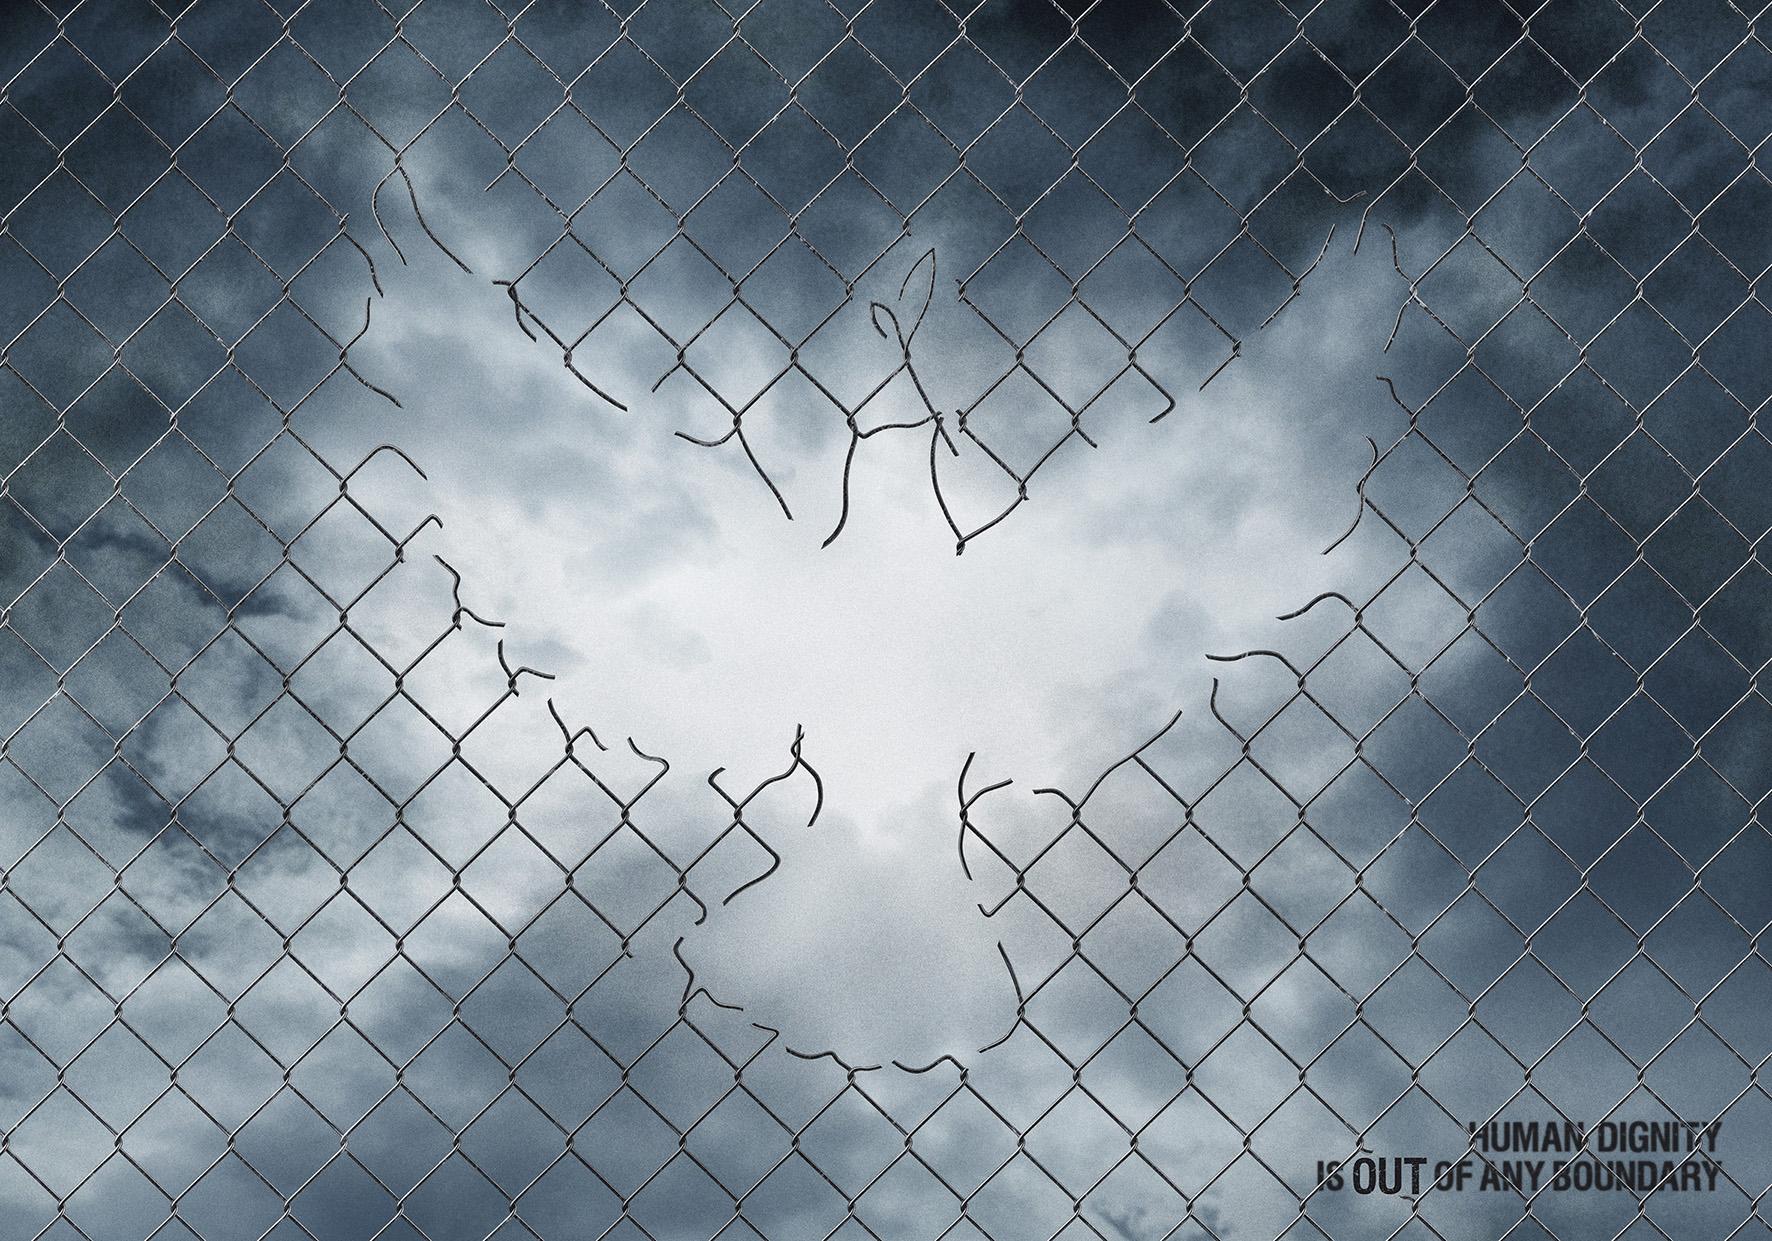 Human dignity boundary. Poster  - rono-1165   ello